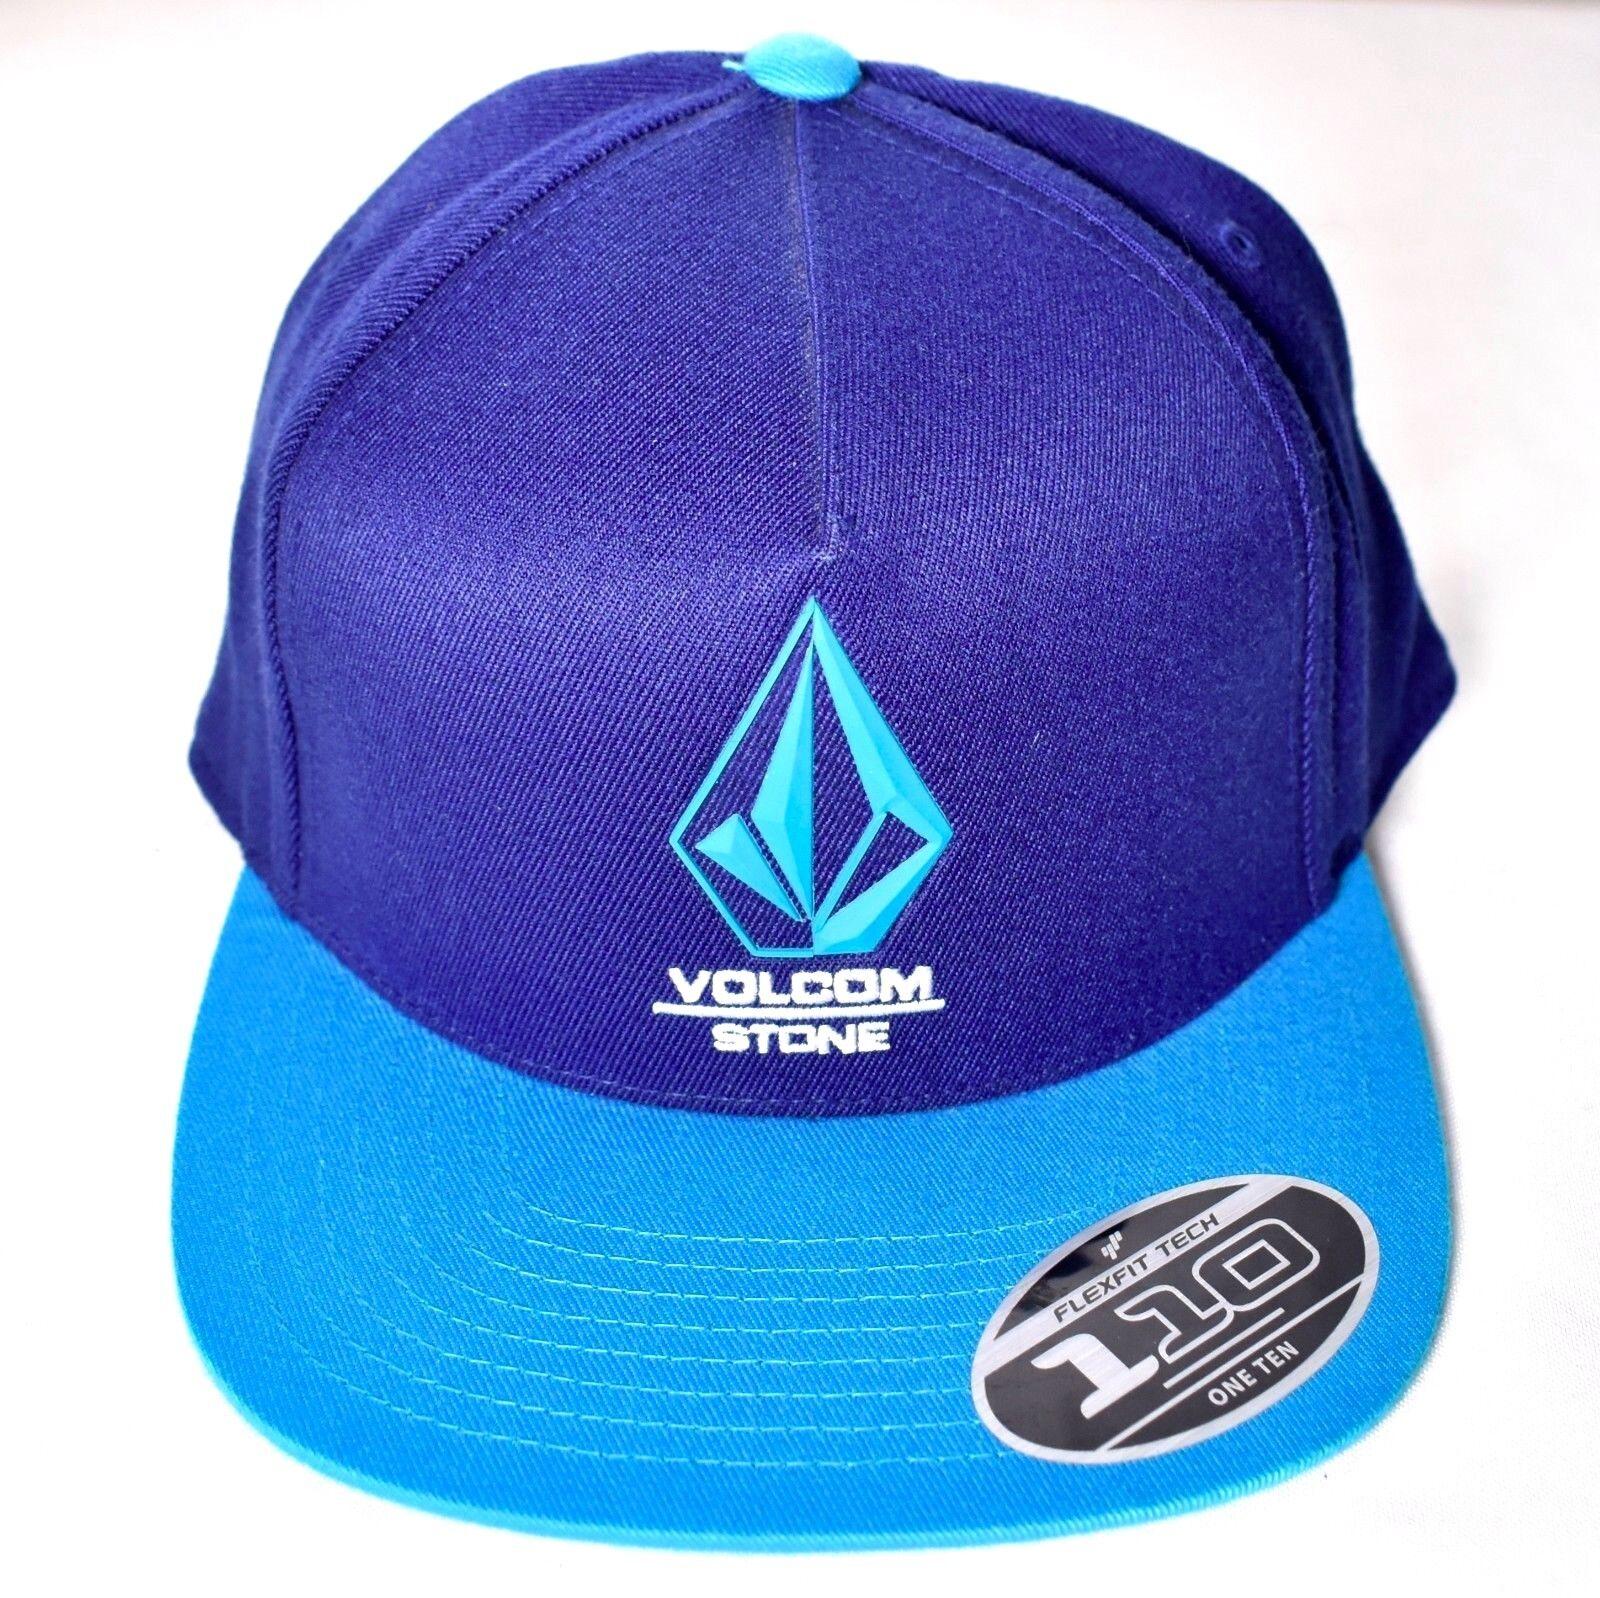 14b3d6a4255c6 ... canada volcom stone adjustable blue bevel snapback hat cap flexfit tech  110 110 110 one ten